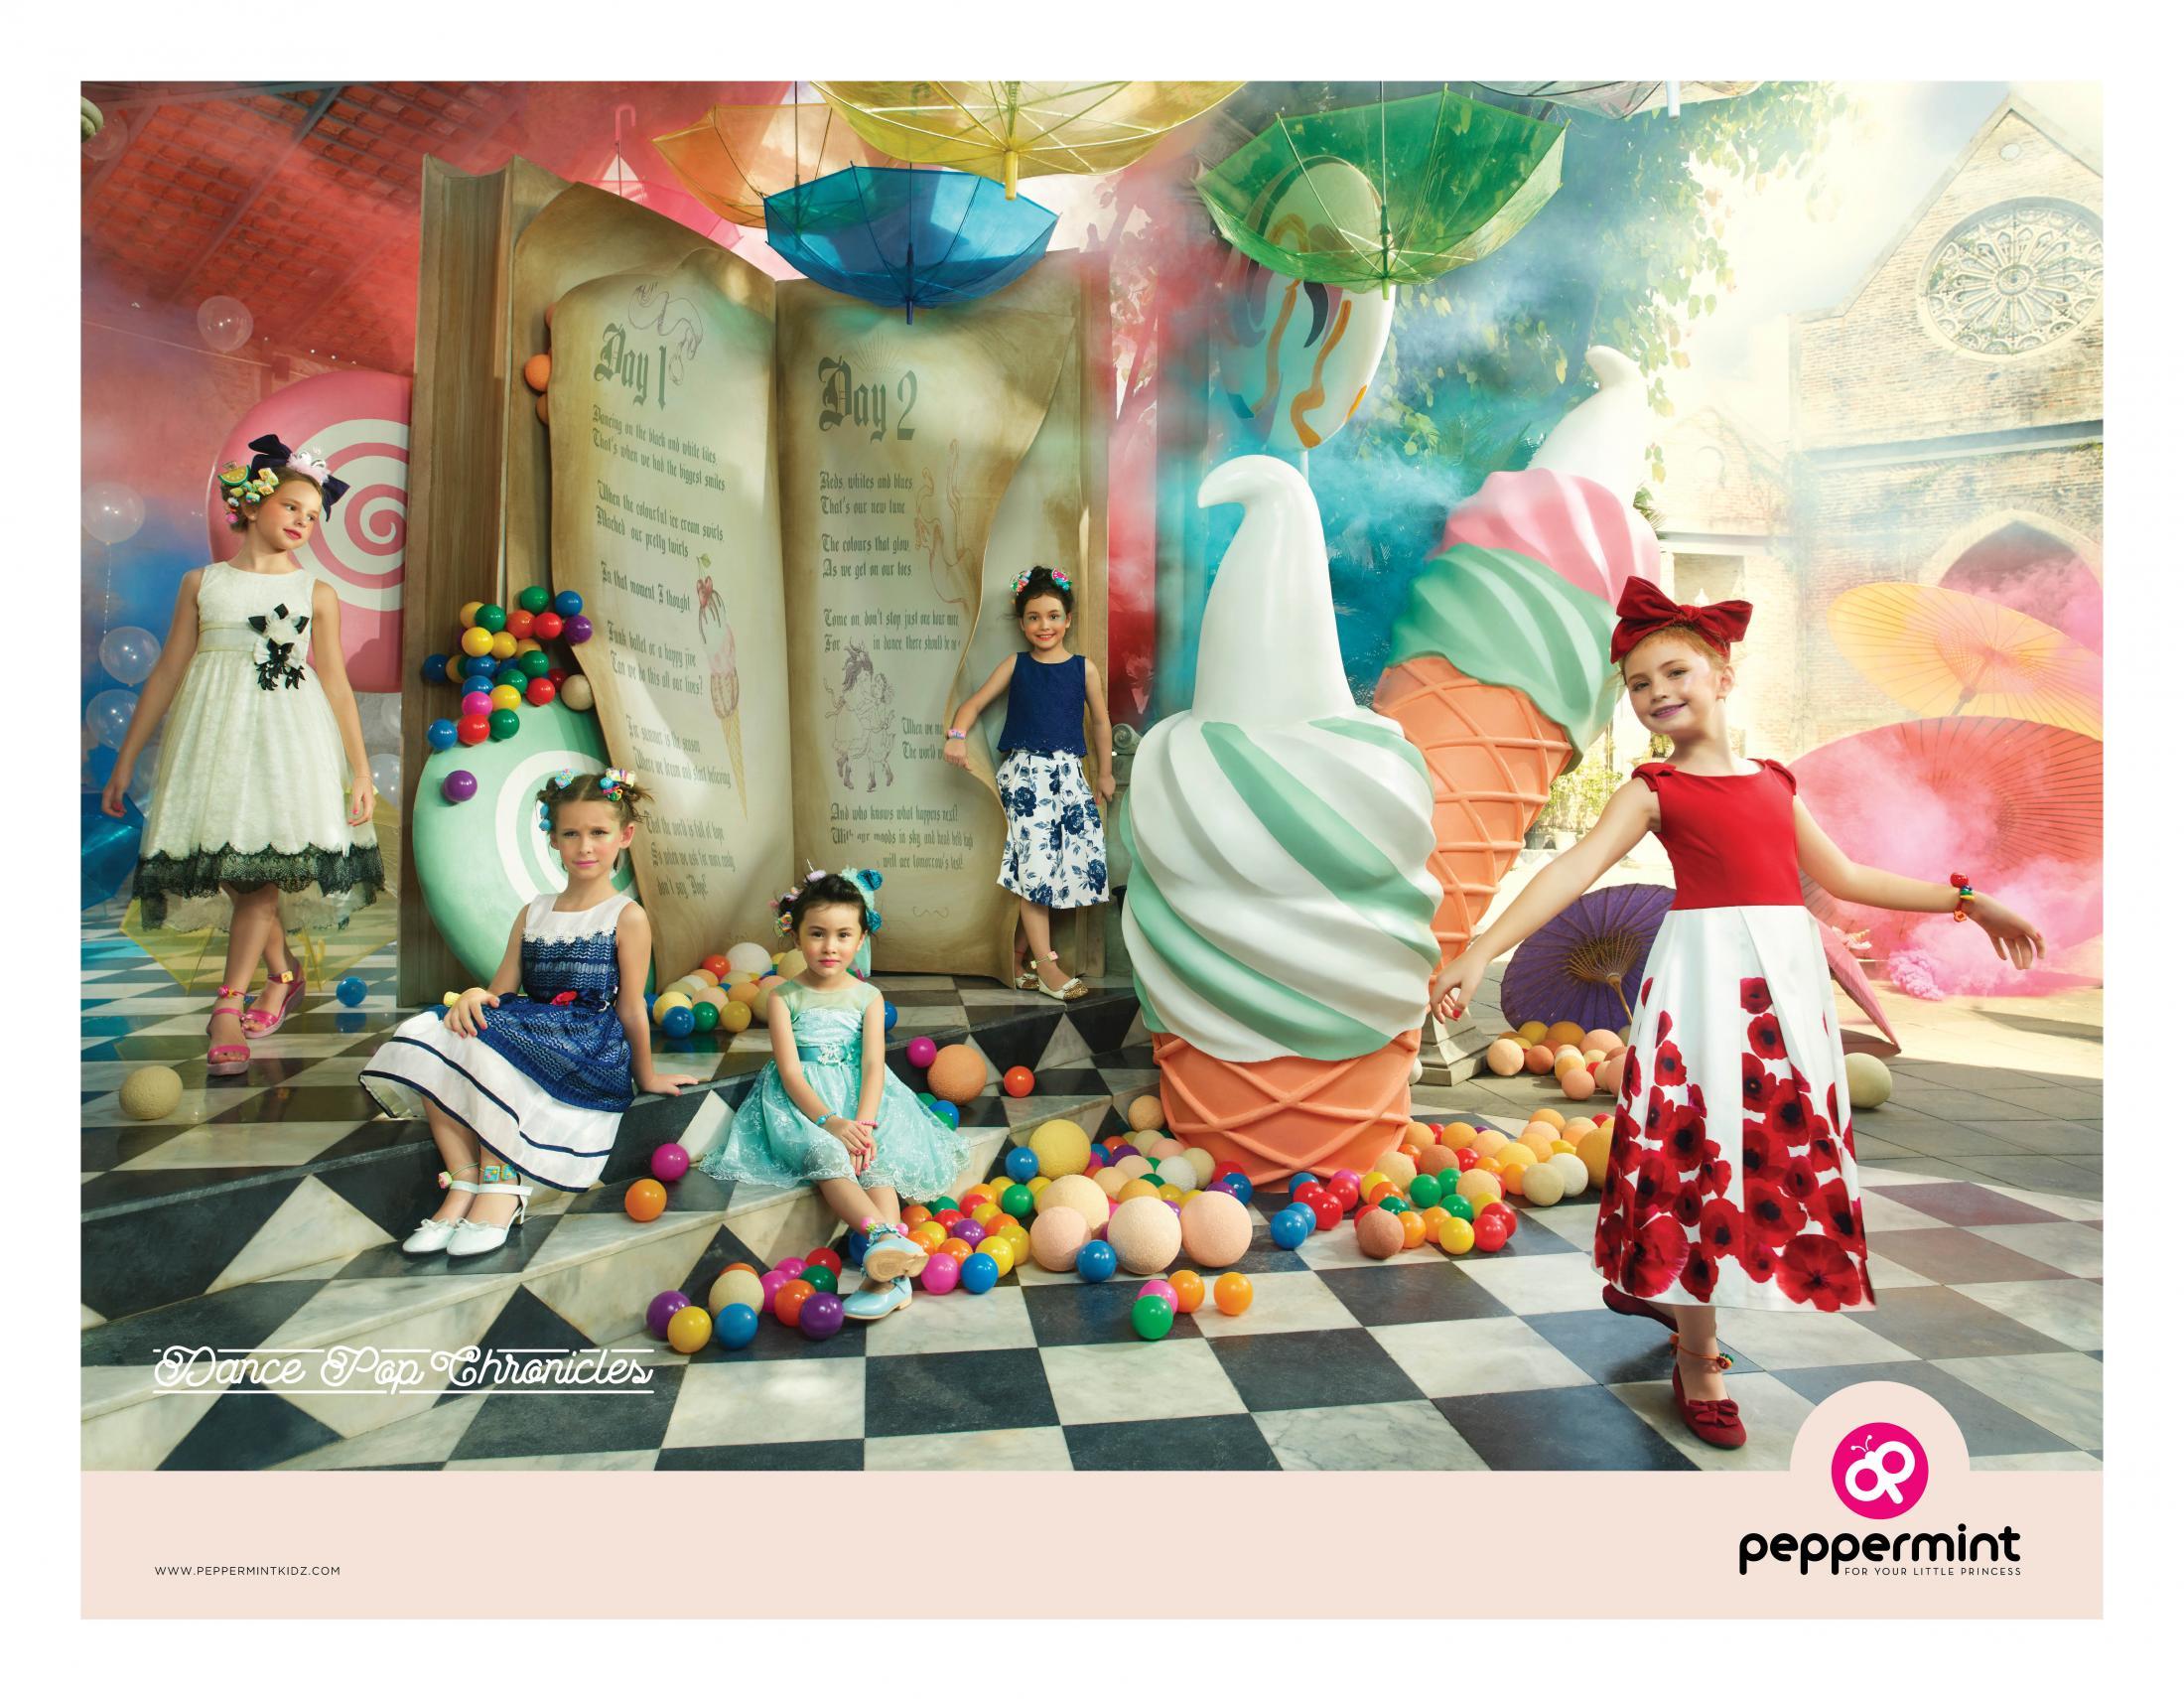 Peppermint Print Ad - Dance Pop Chronicles